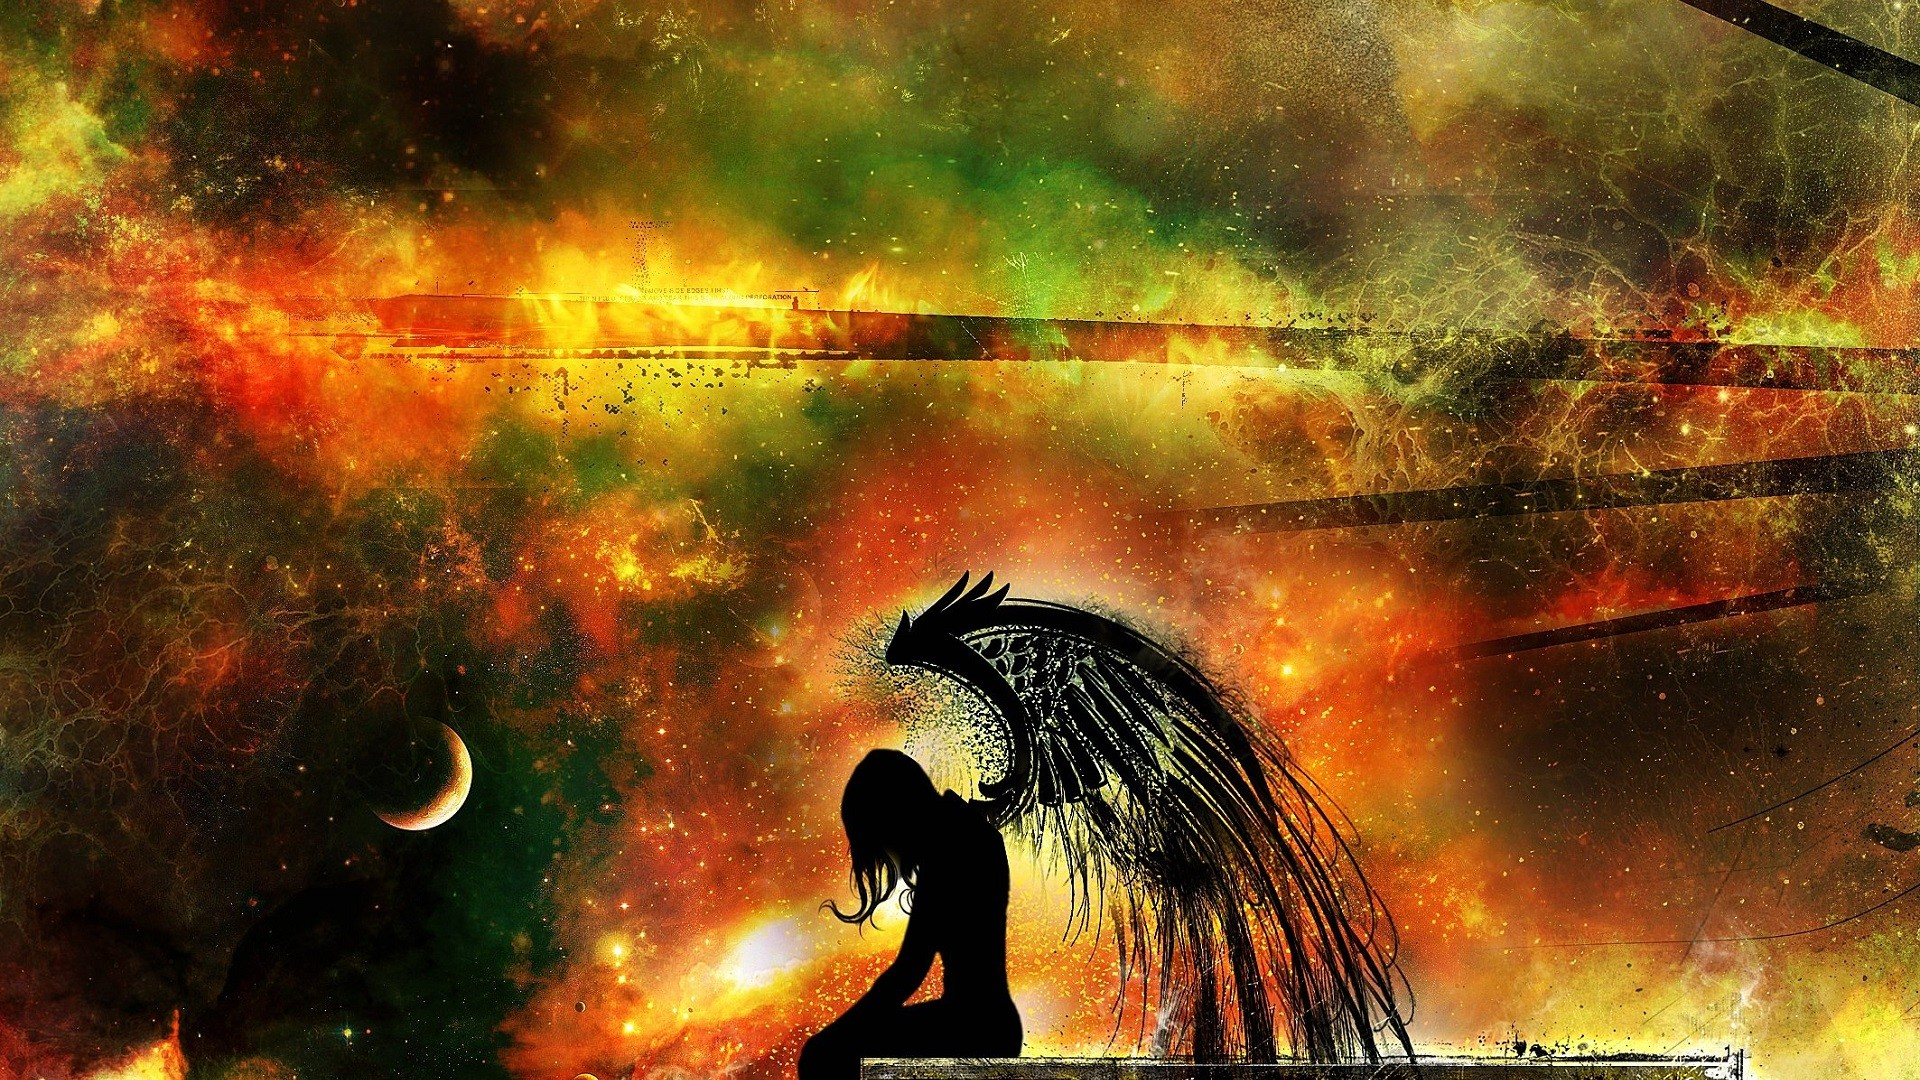 General 1920x1080 space stars Moon angel Klayton Wish Upon a Blackstar